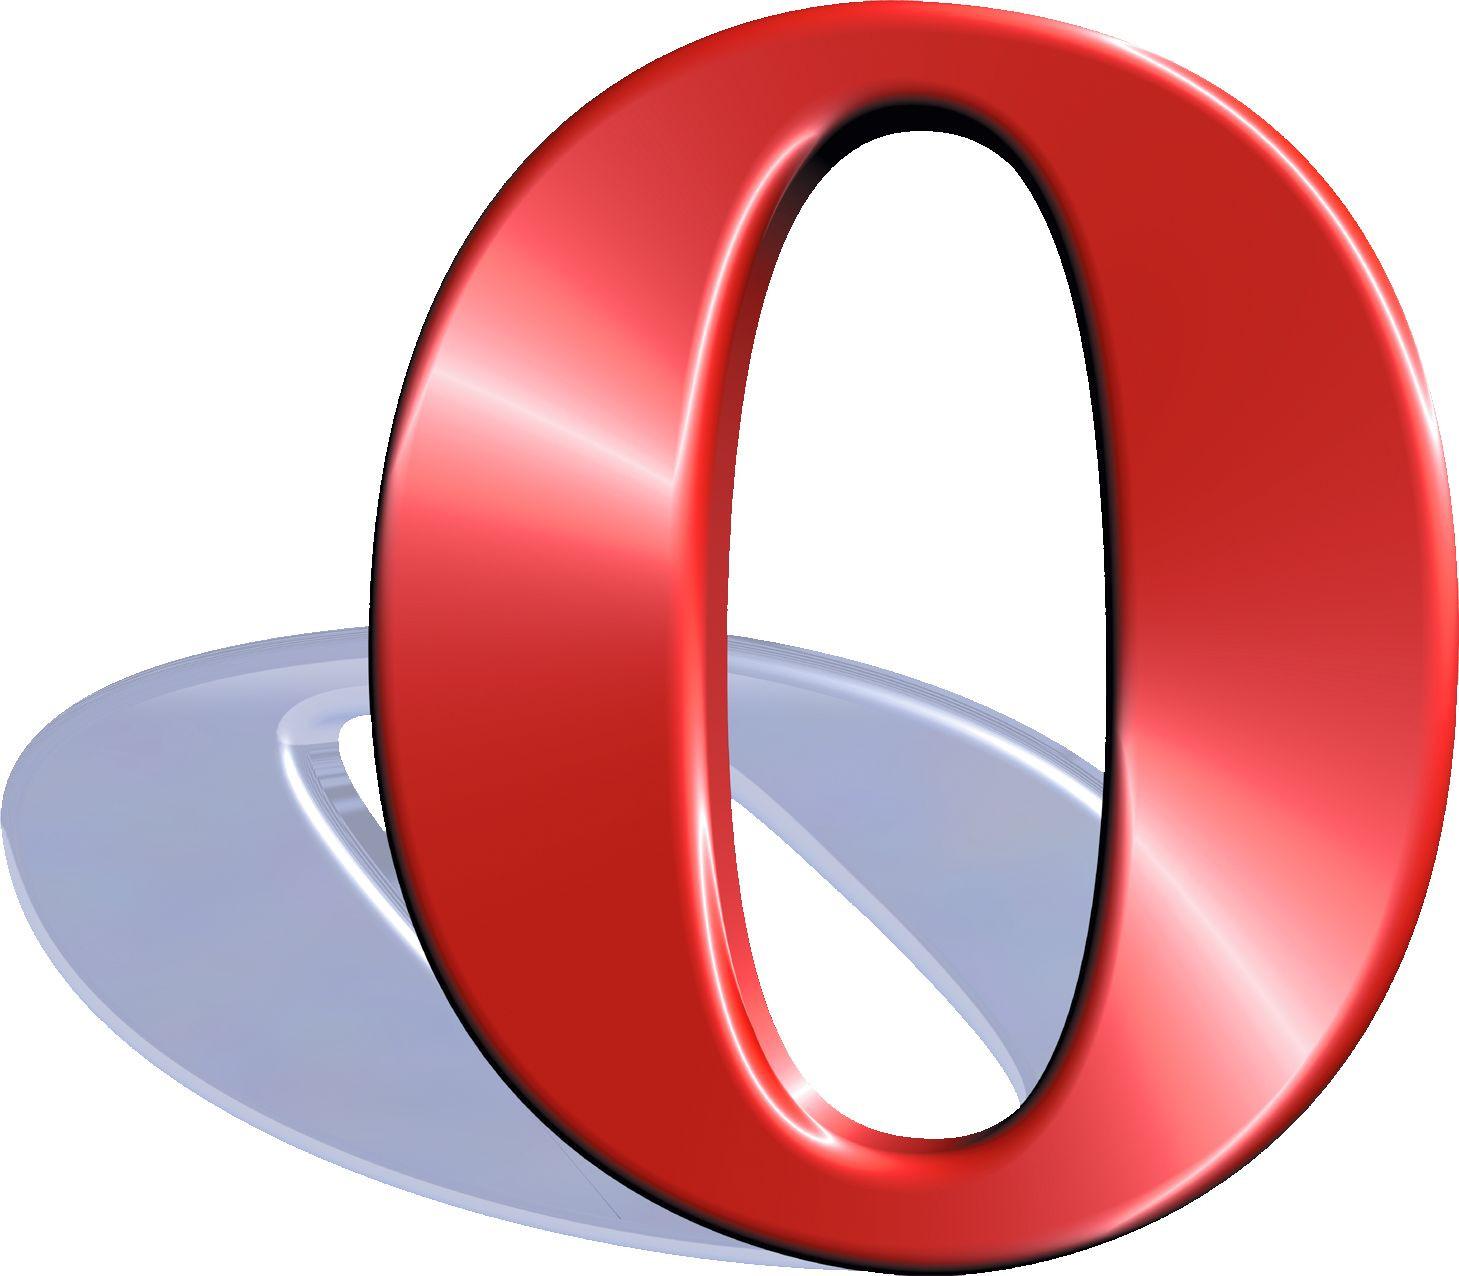 opera 2014 gratuit clubic